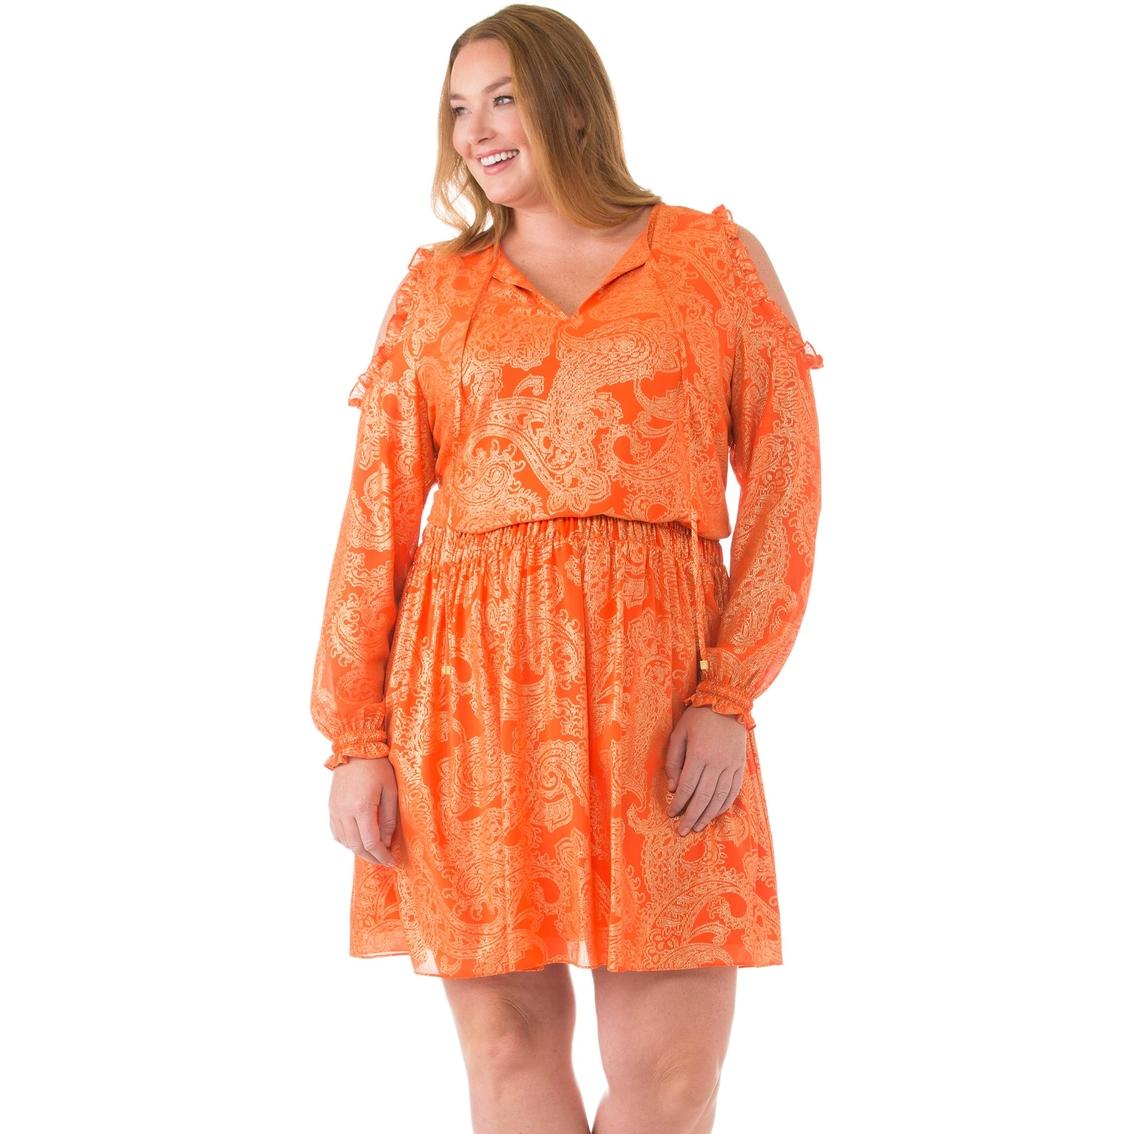 Michael Kors Plus Size Samara Cold Shoulder Dress | Dresses ...